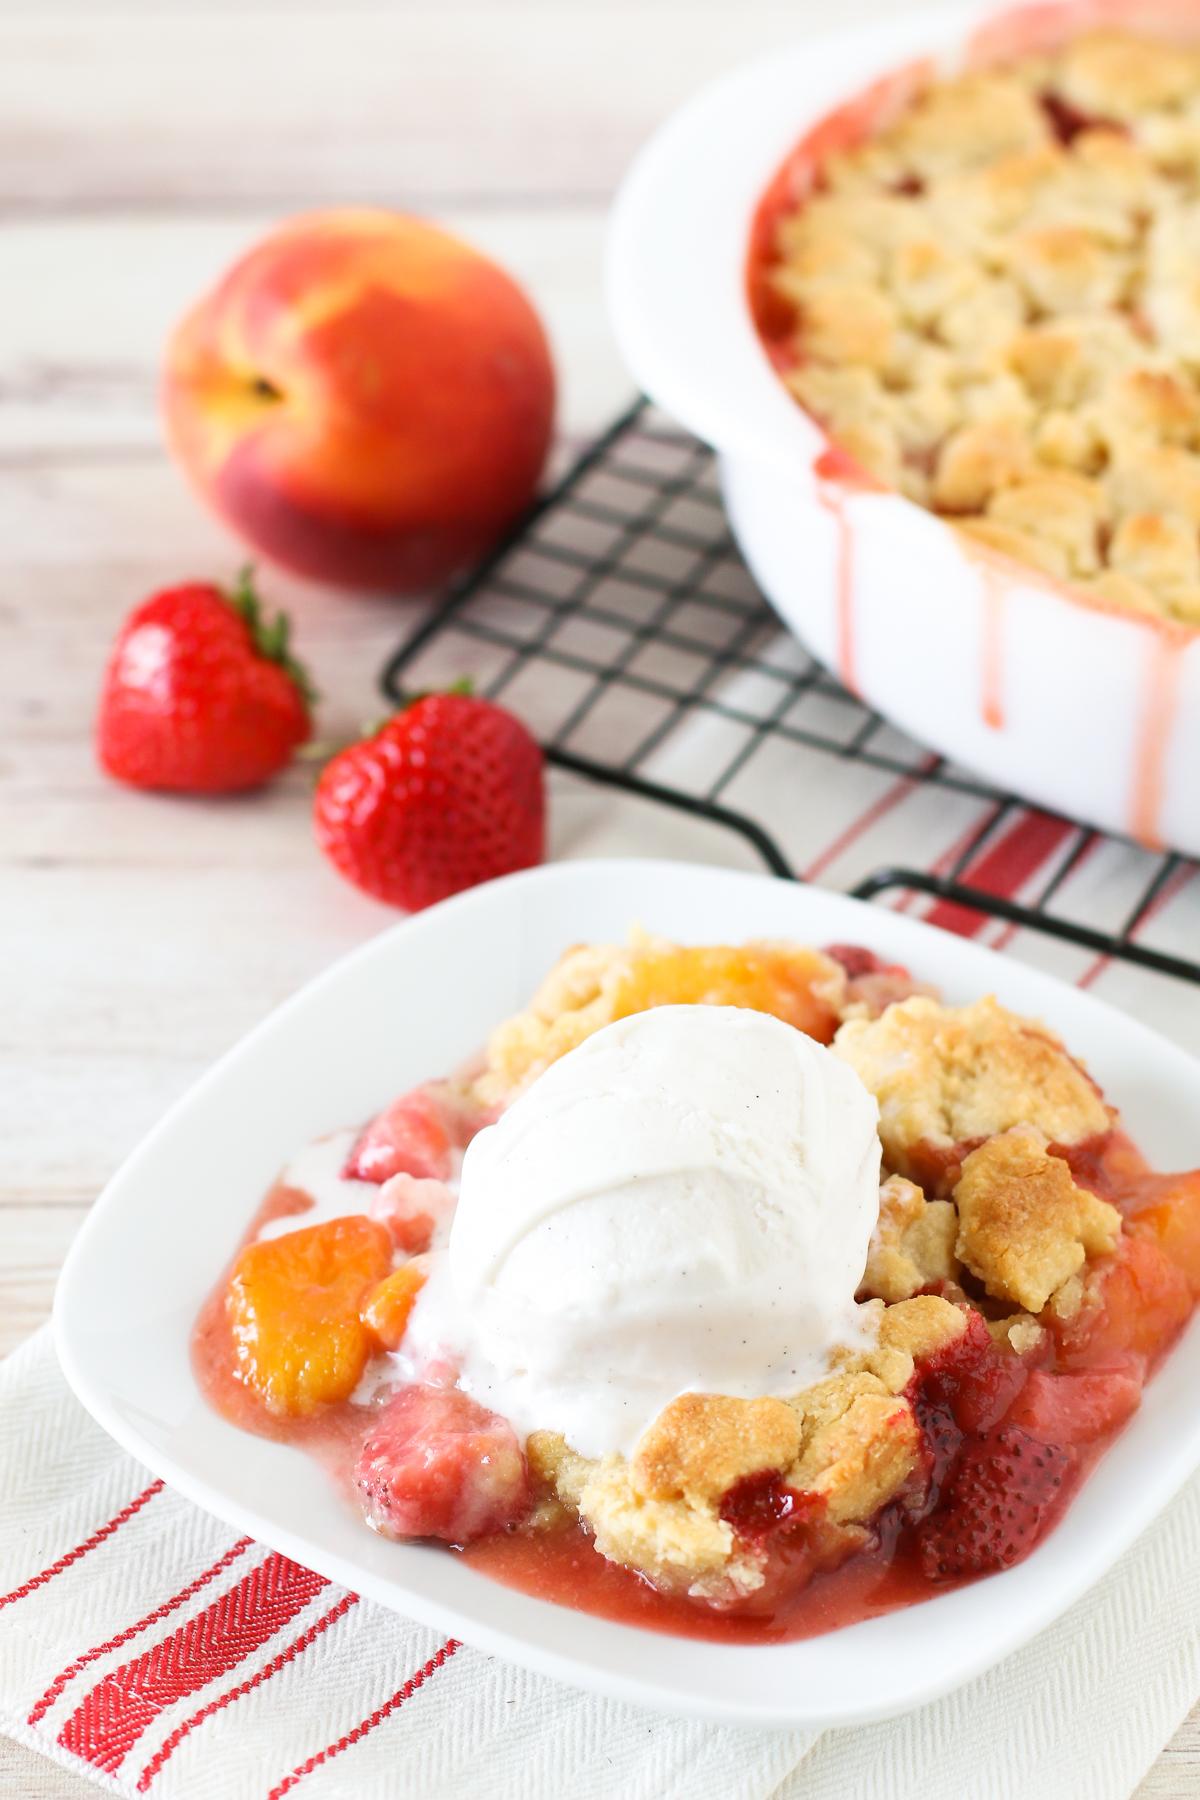 Grain Free Vegan Strawberry Peach Crisp. Golden grain free crisp topping over sweet, juicy strawberries and peaches.